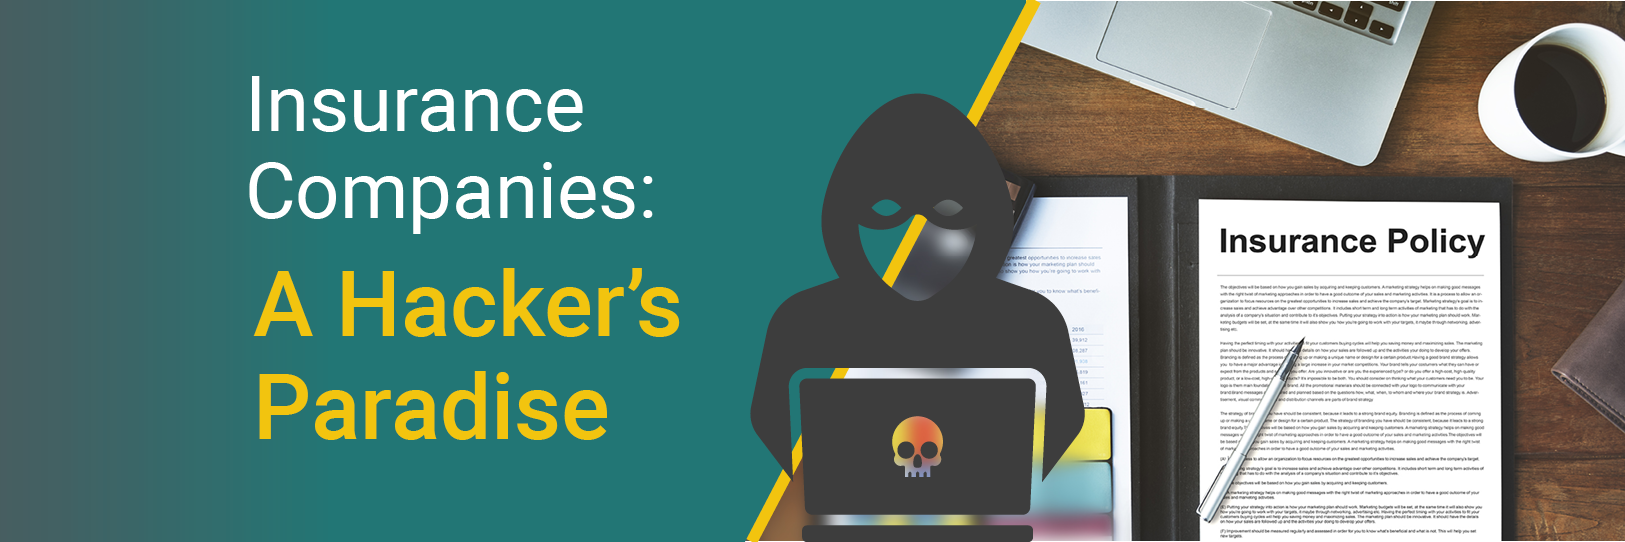 Insurance Companies: A Hacker's Paradise